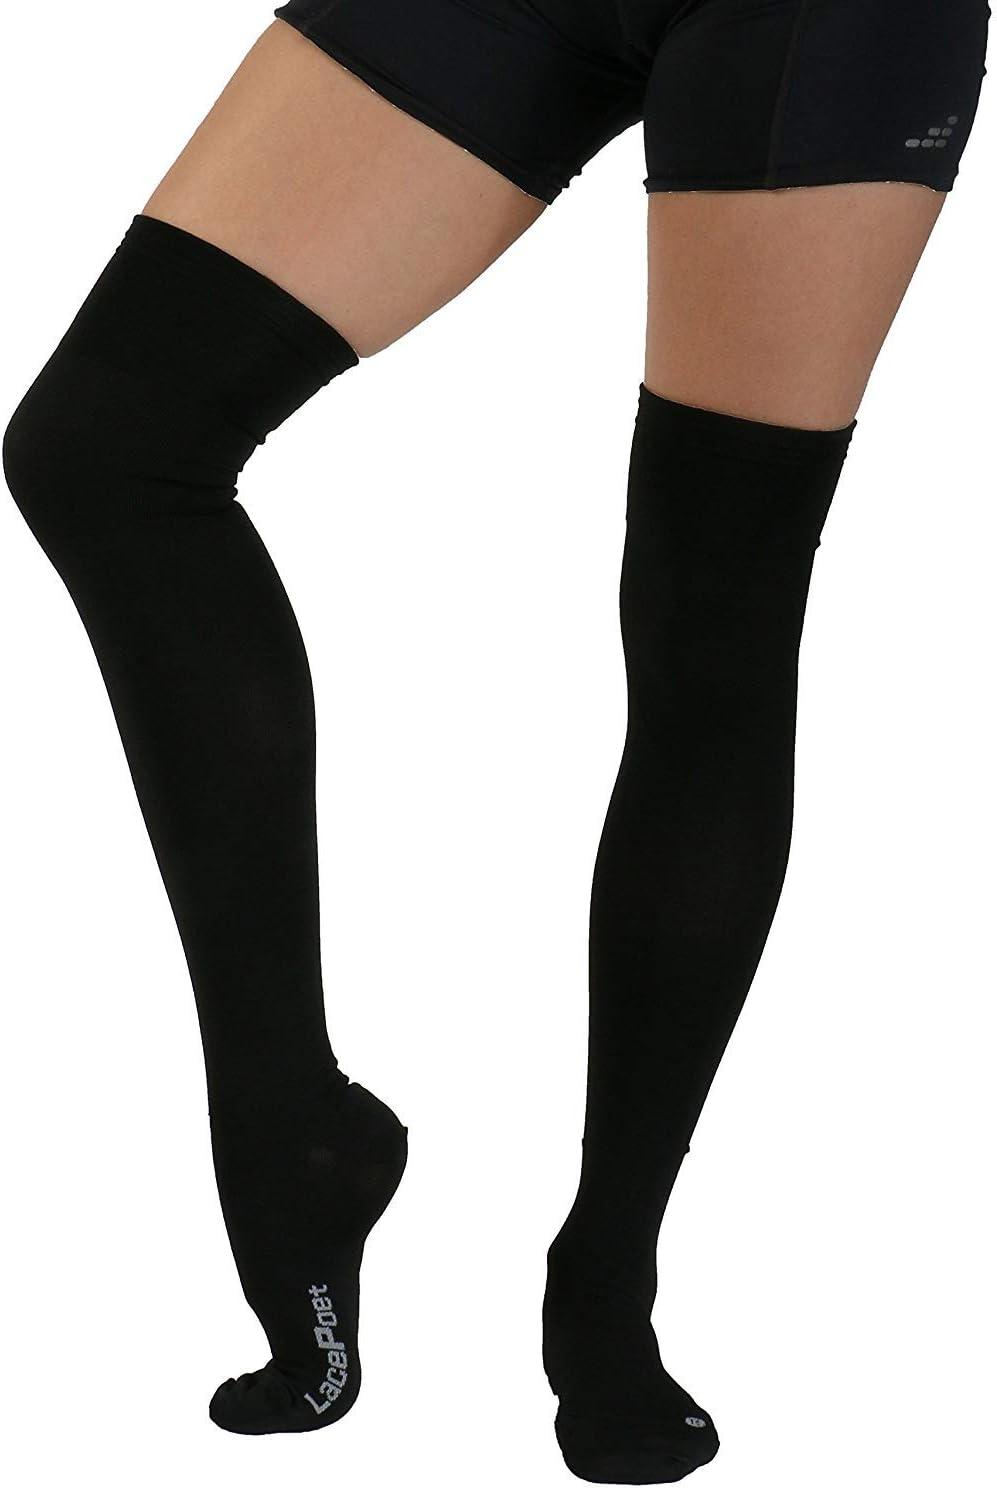 knee compression socks